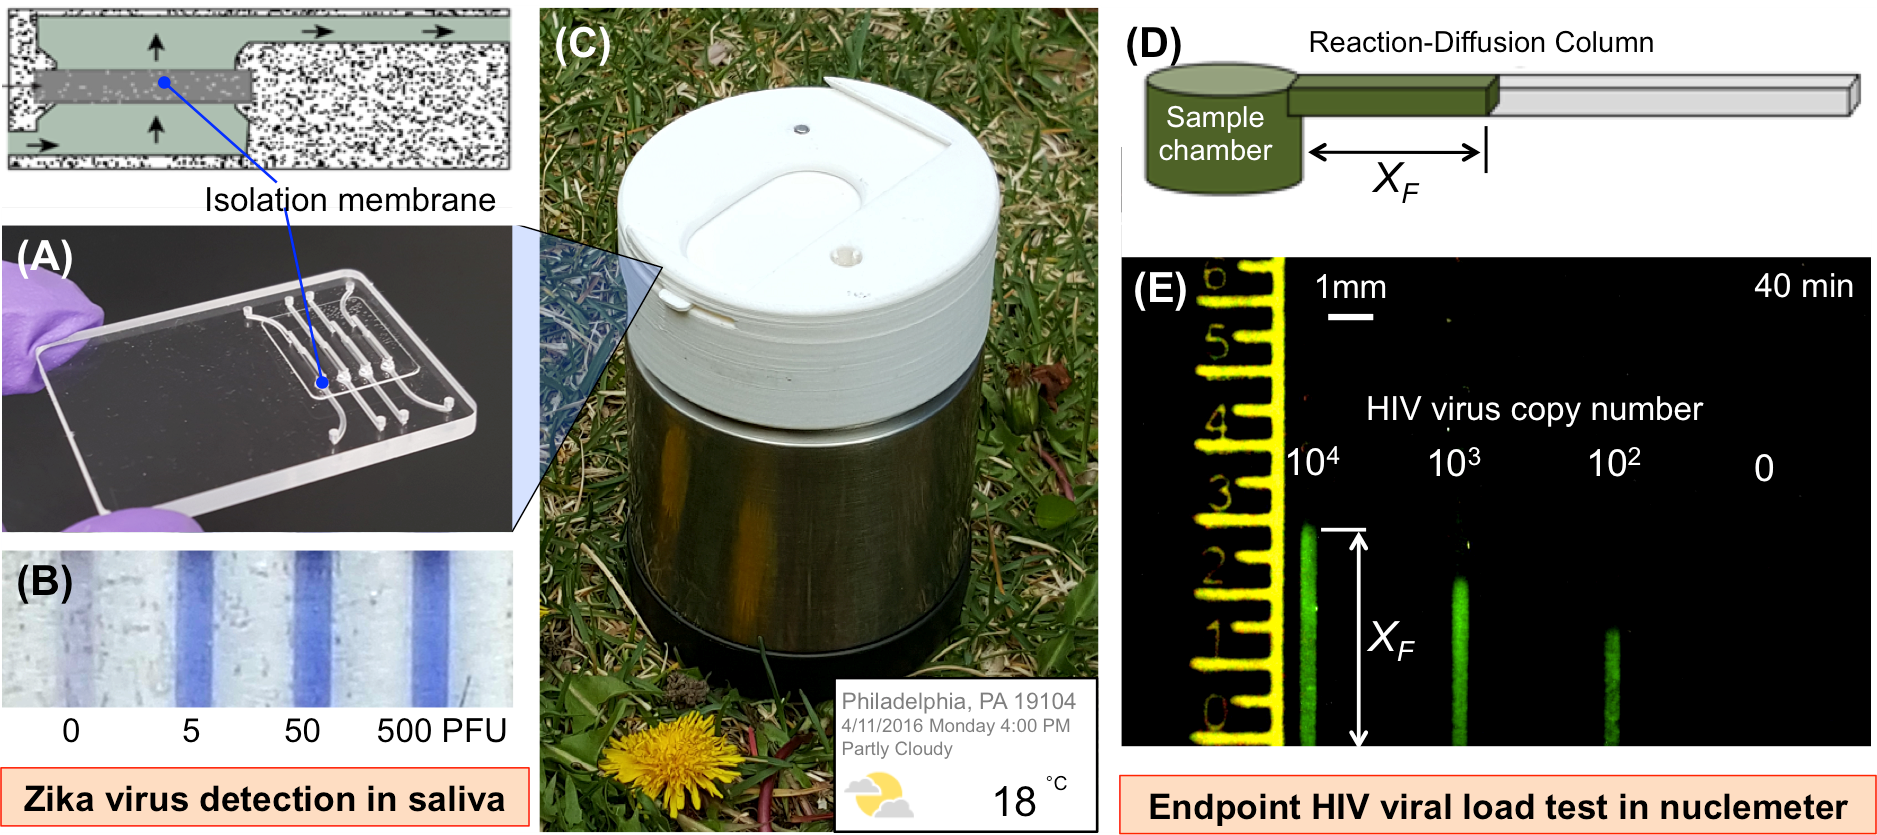 Microfluidic Technology for Point of Care Molecular Diagnostics